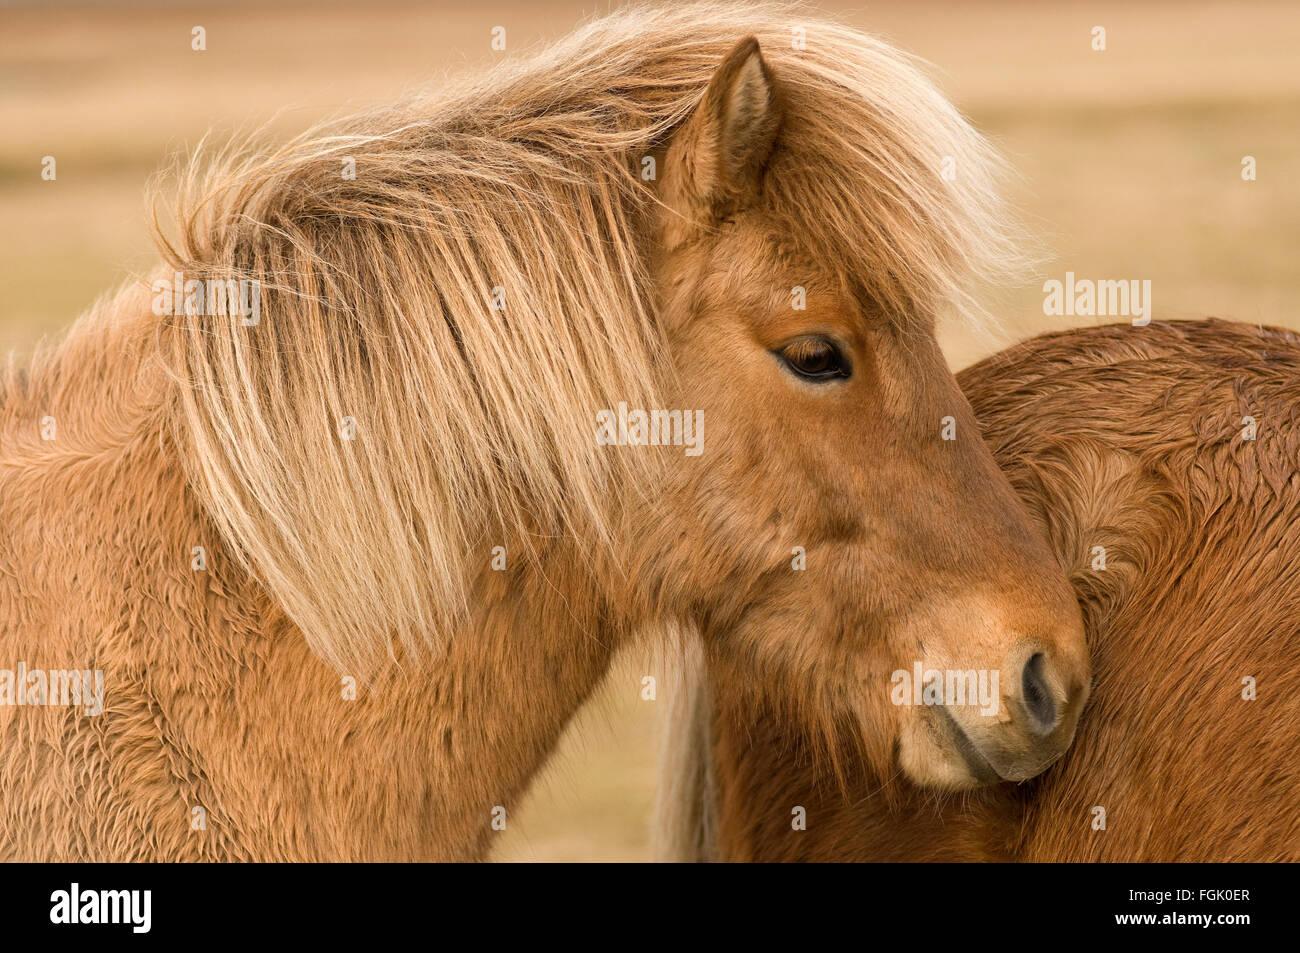 Portrait of an Icelandic horse - Stock Image